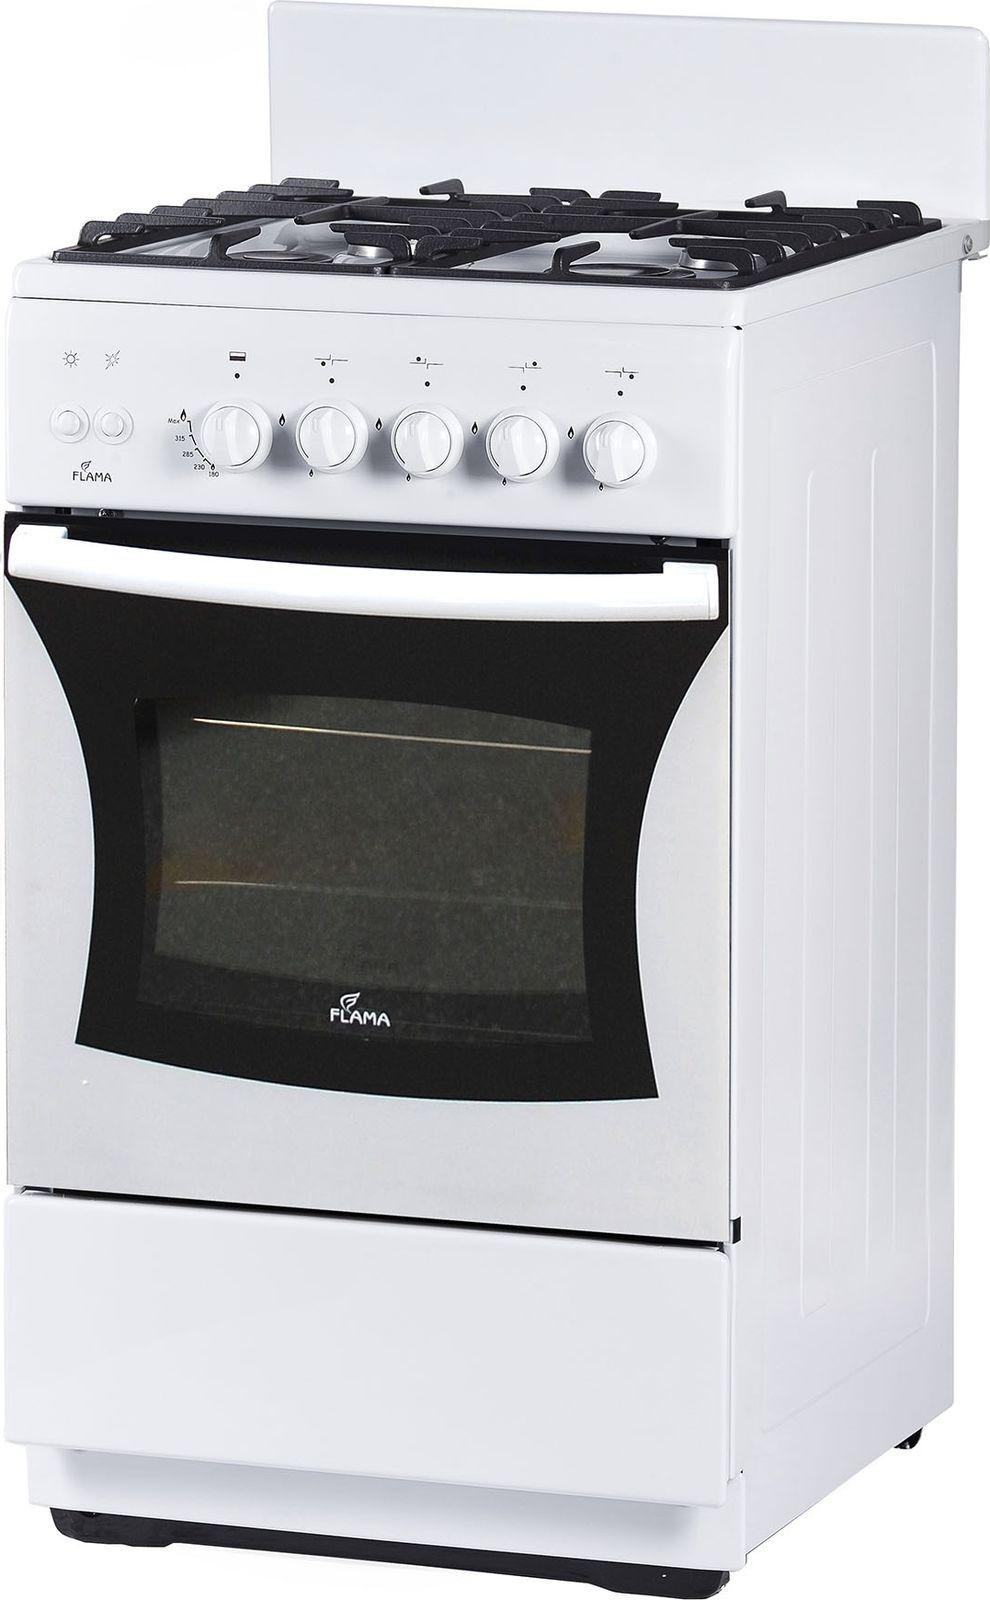 Кухонная плита Flama FG 24229 W, белый